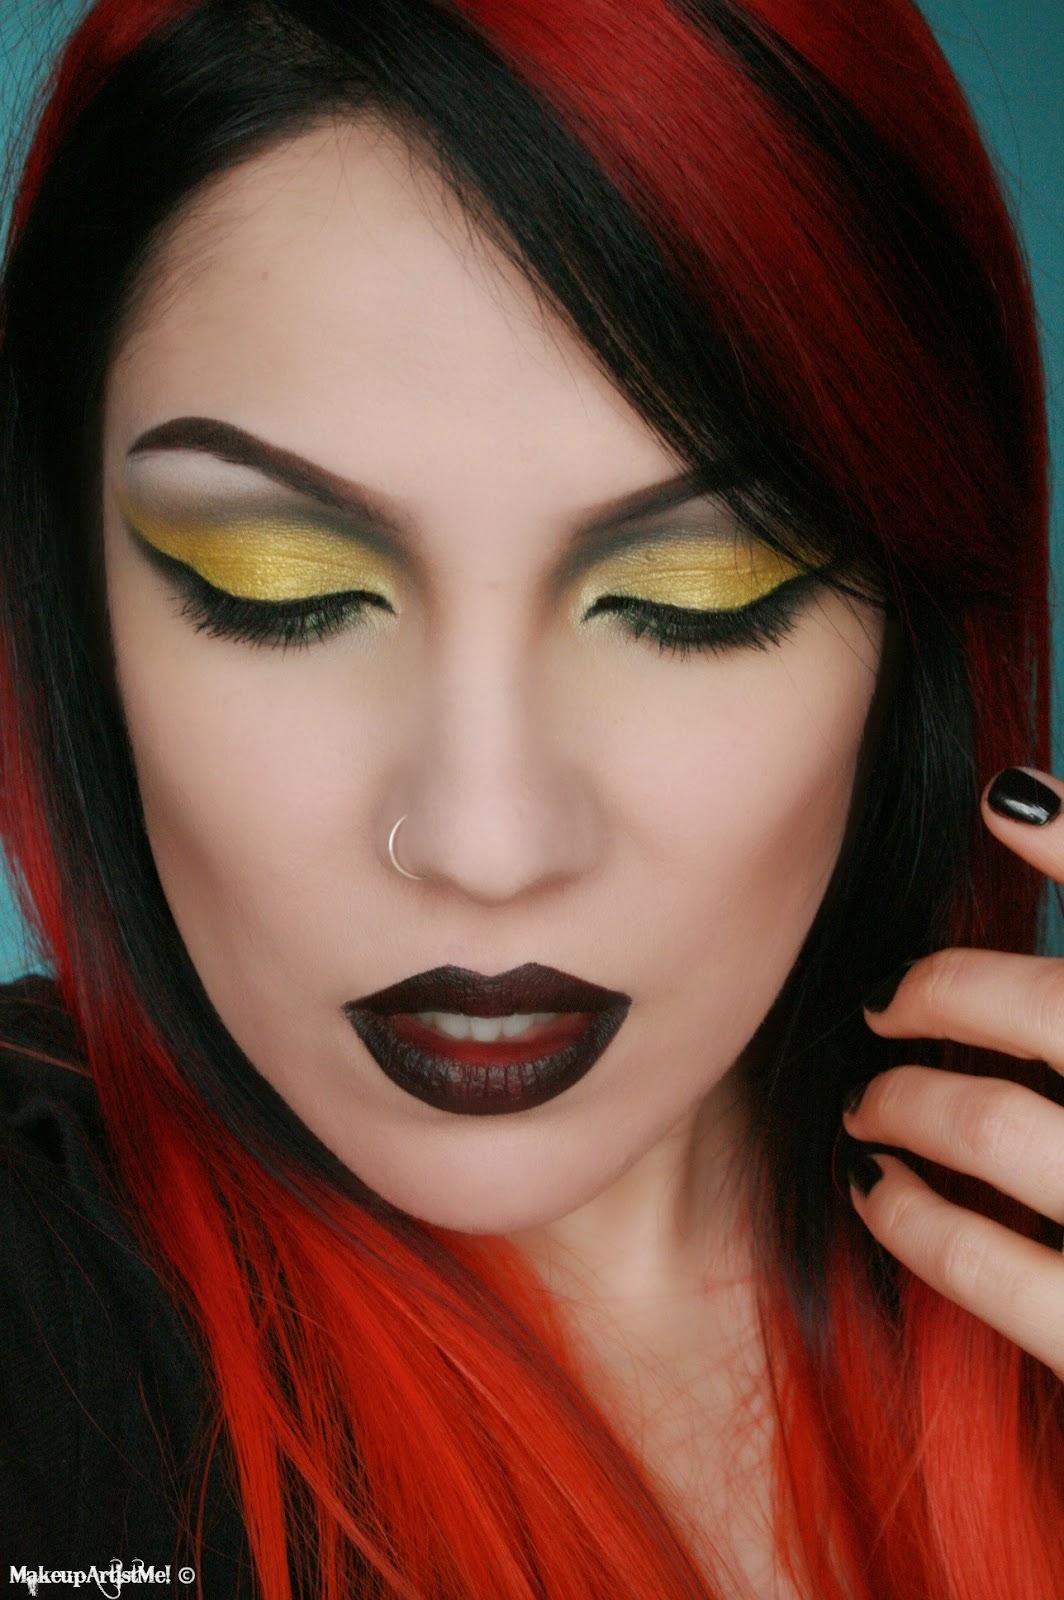 Make Up Artist Me Sunny Edge Makeup Tutorial